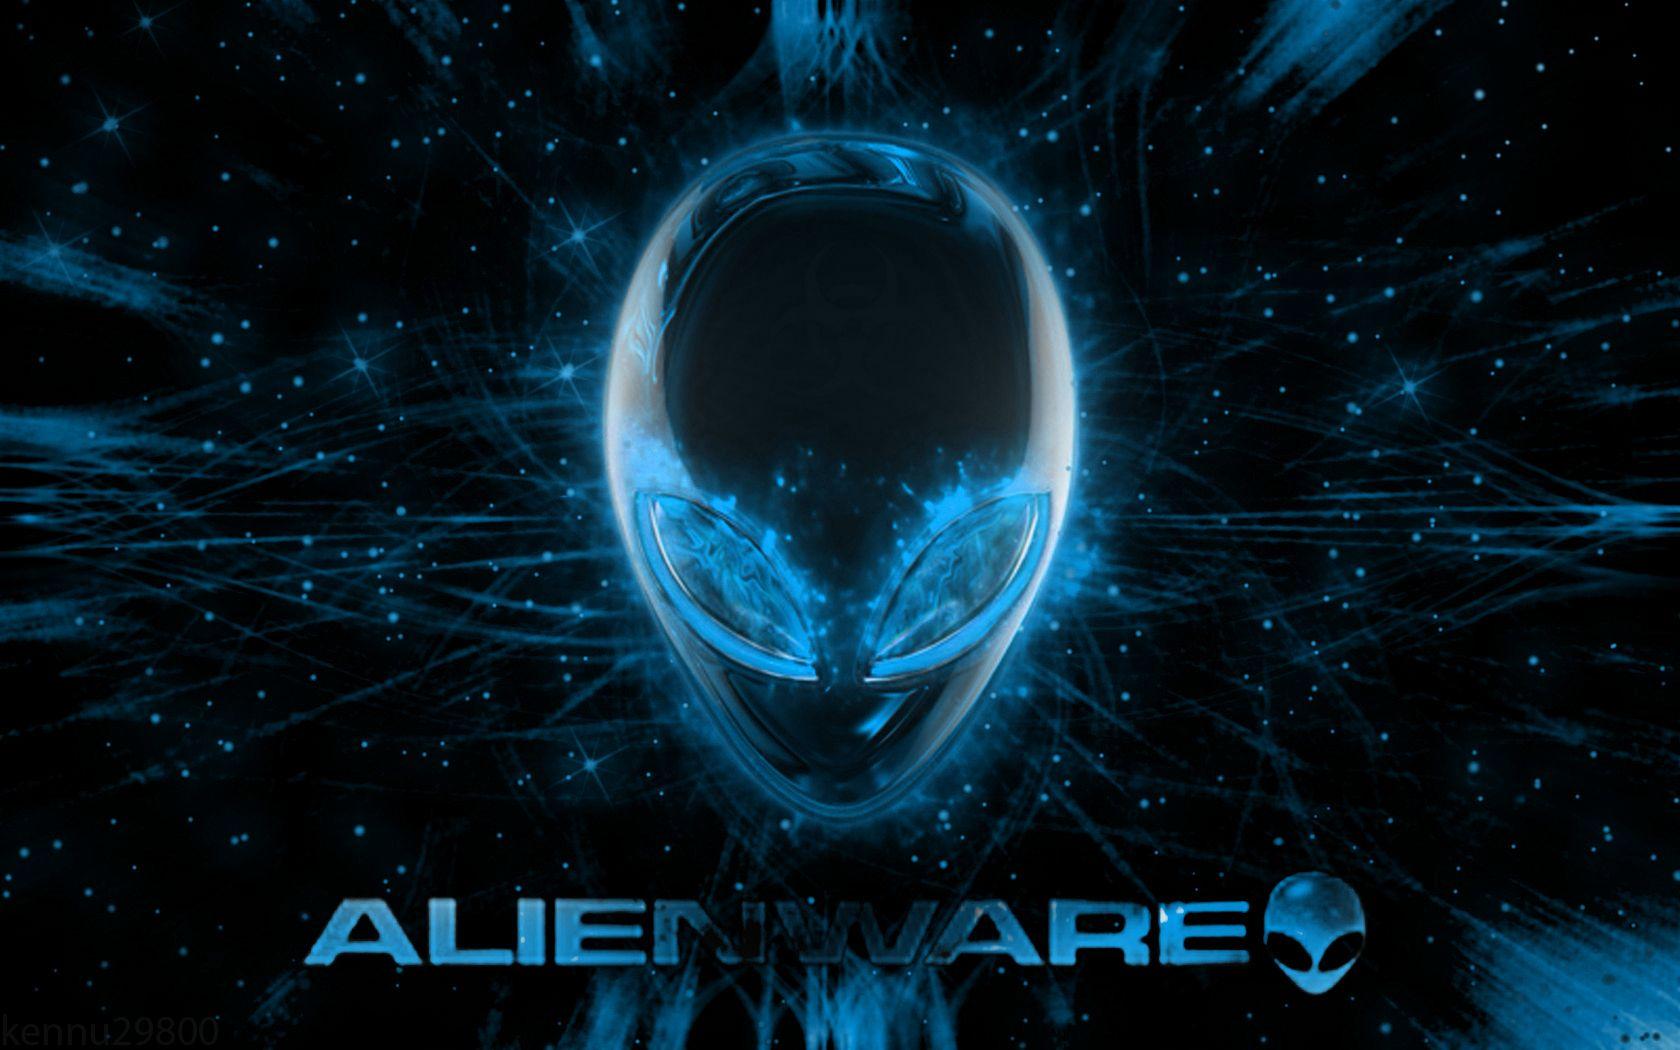 My Alienware Blue And Red Alienware Wallpaper Eyes Wallpaper